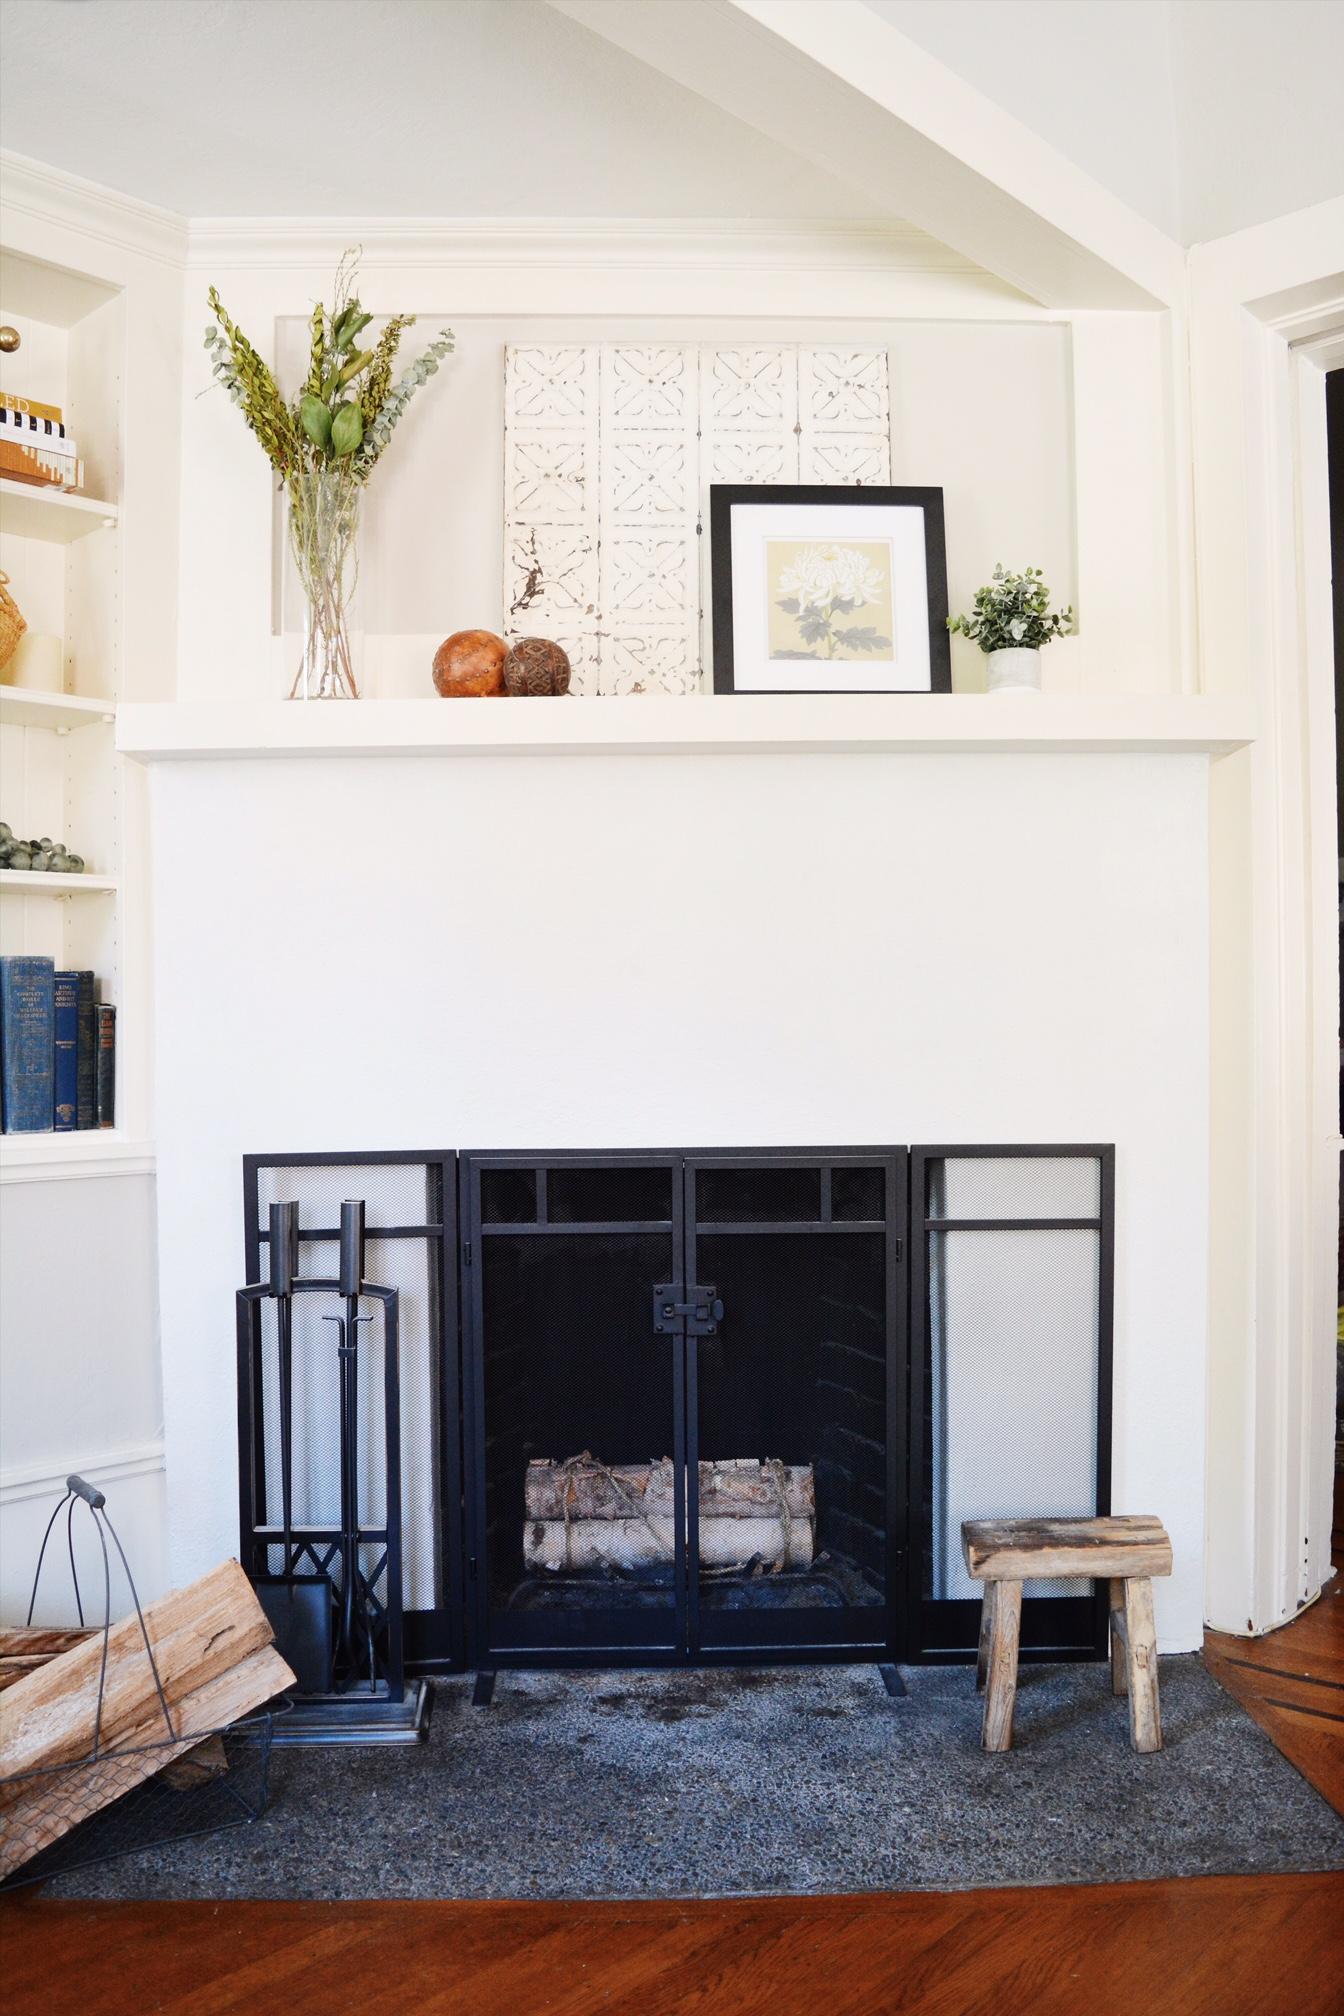 Angela Grace Design // Filbert Living Room // San Francisco and SF Bay Area Interior Designer, Decorator